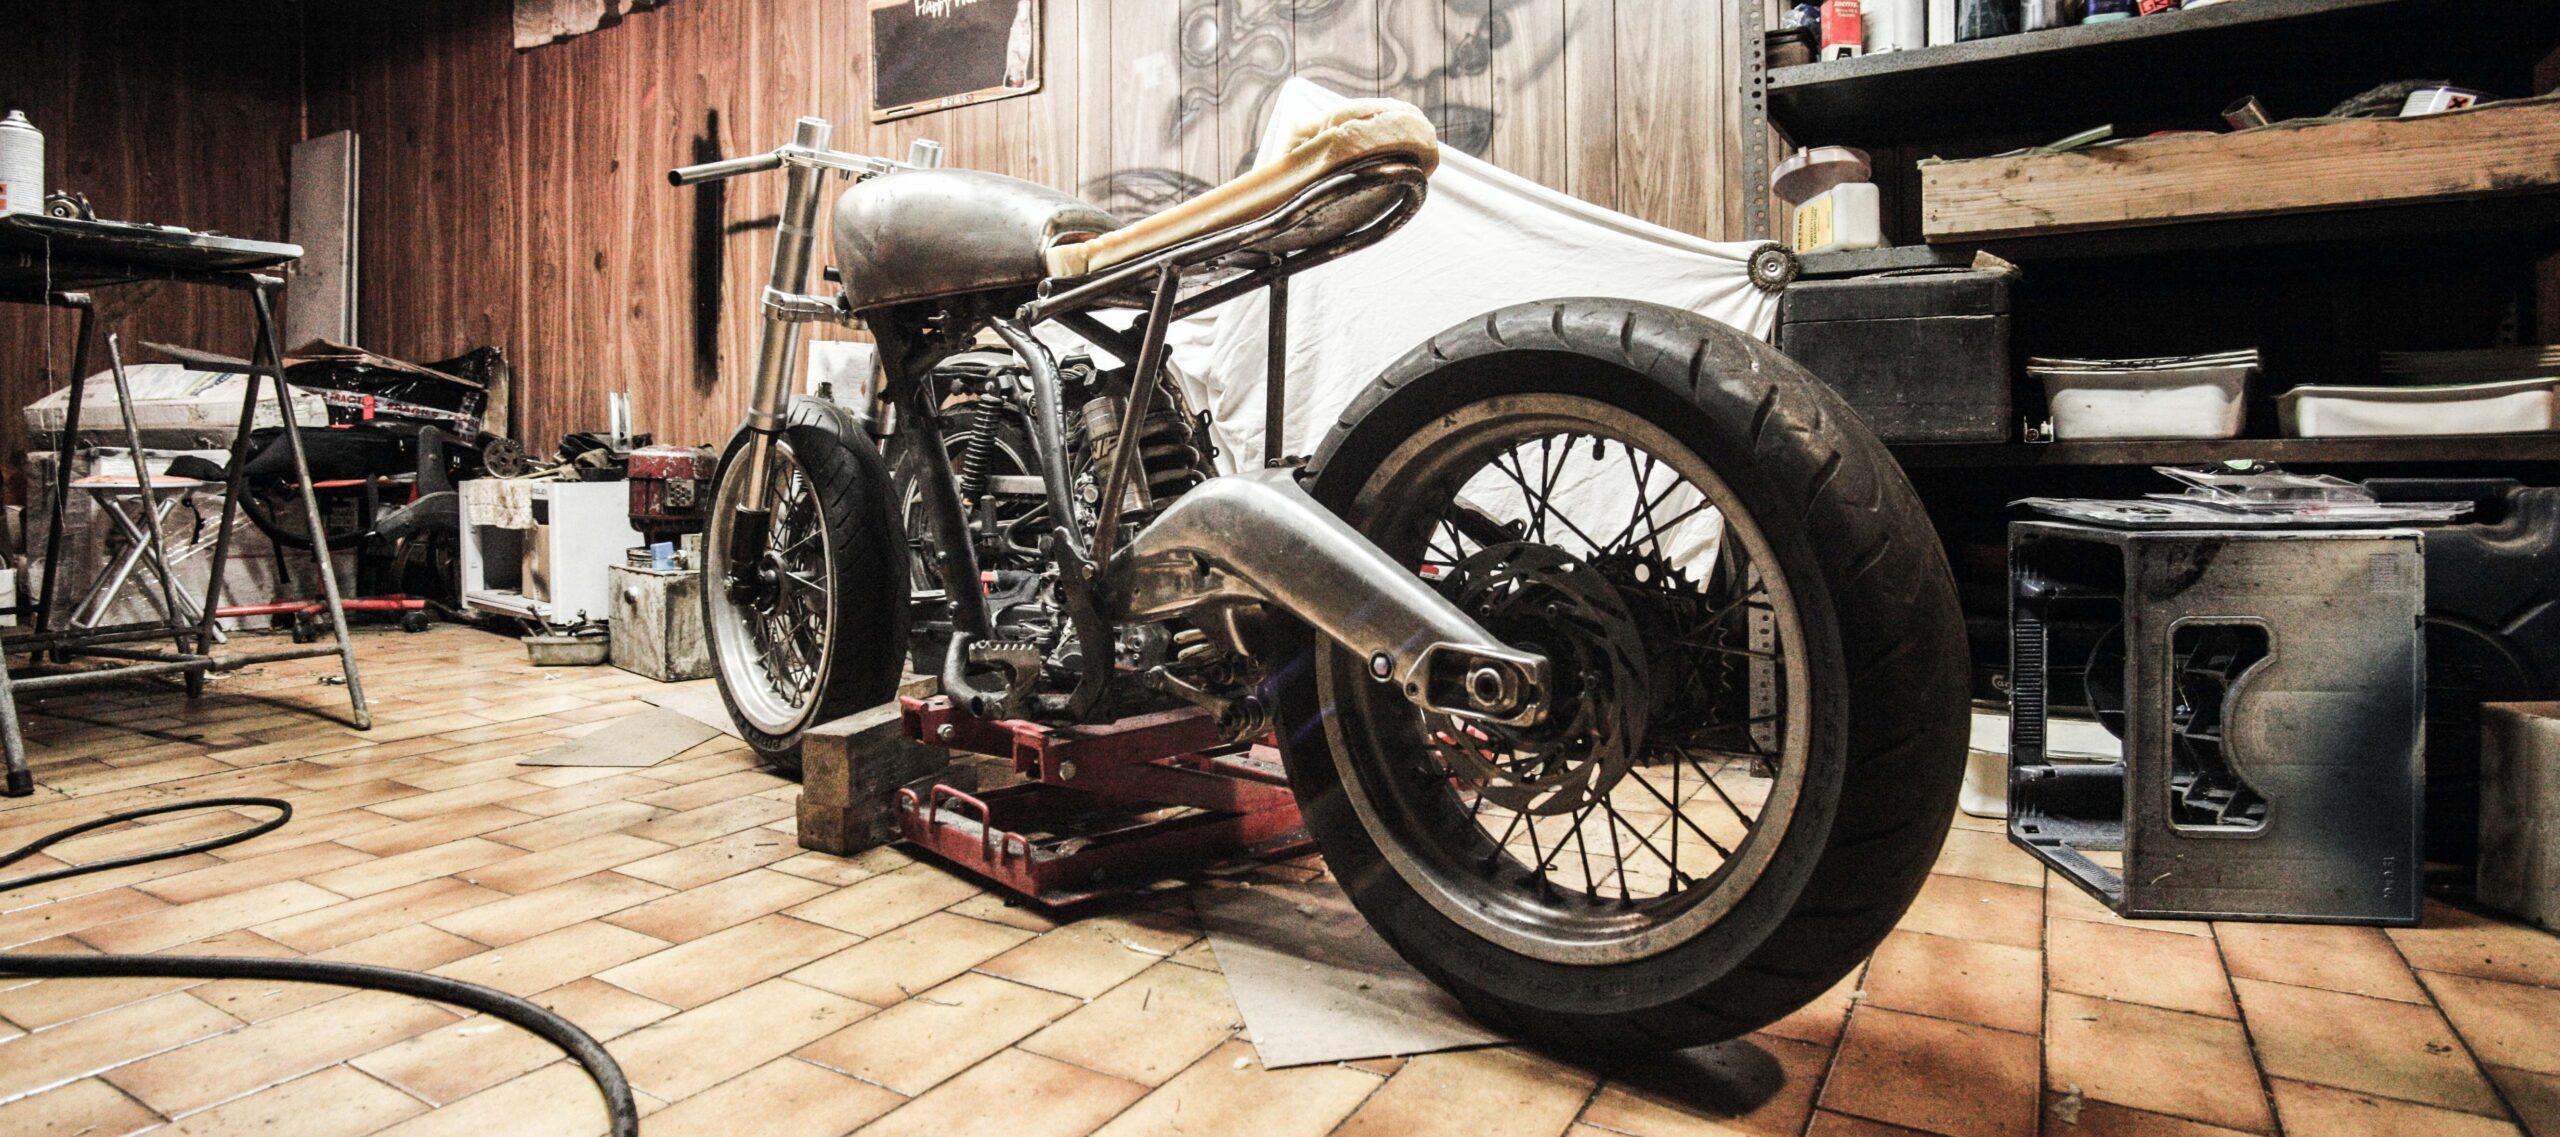 Motorcycle Shop Image